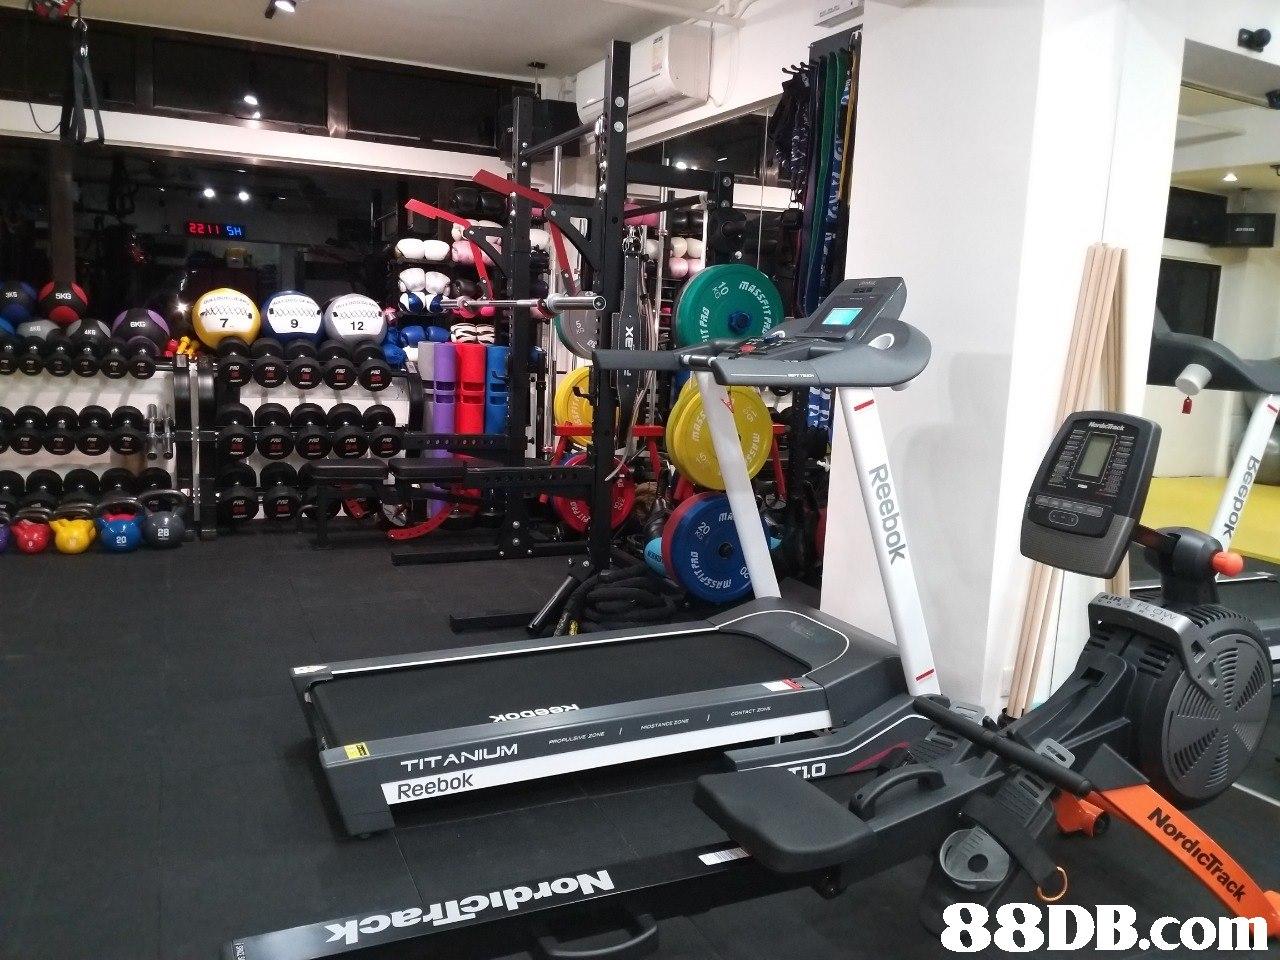 221 SH 12 IL 20 Reebok   gym,structure,room,exercise machine,sport venue